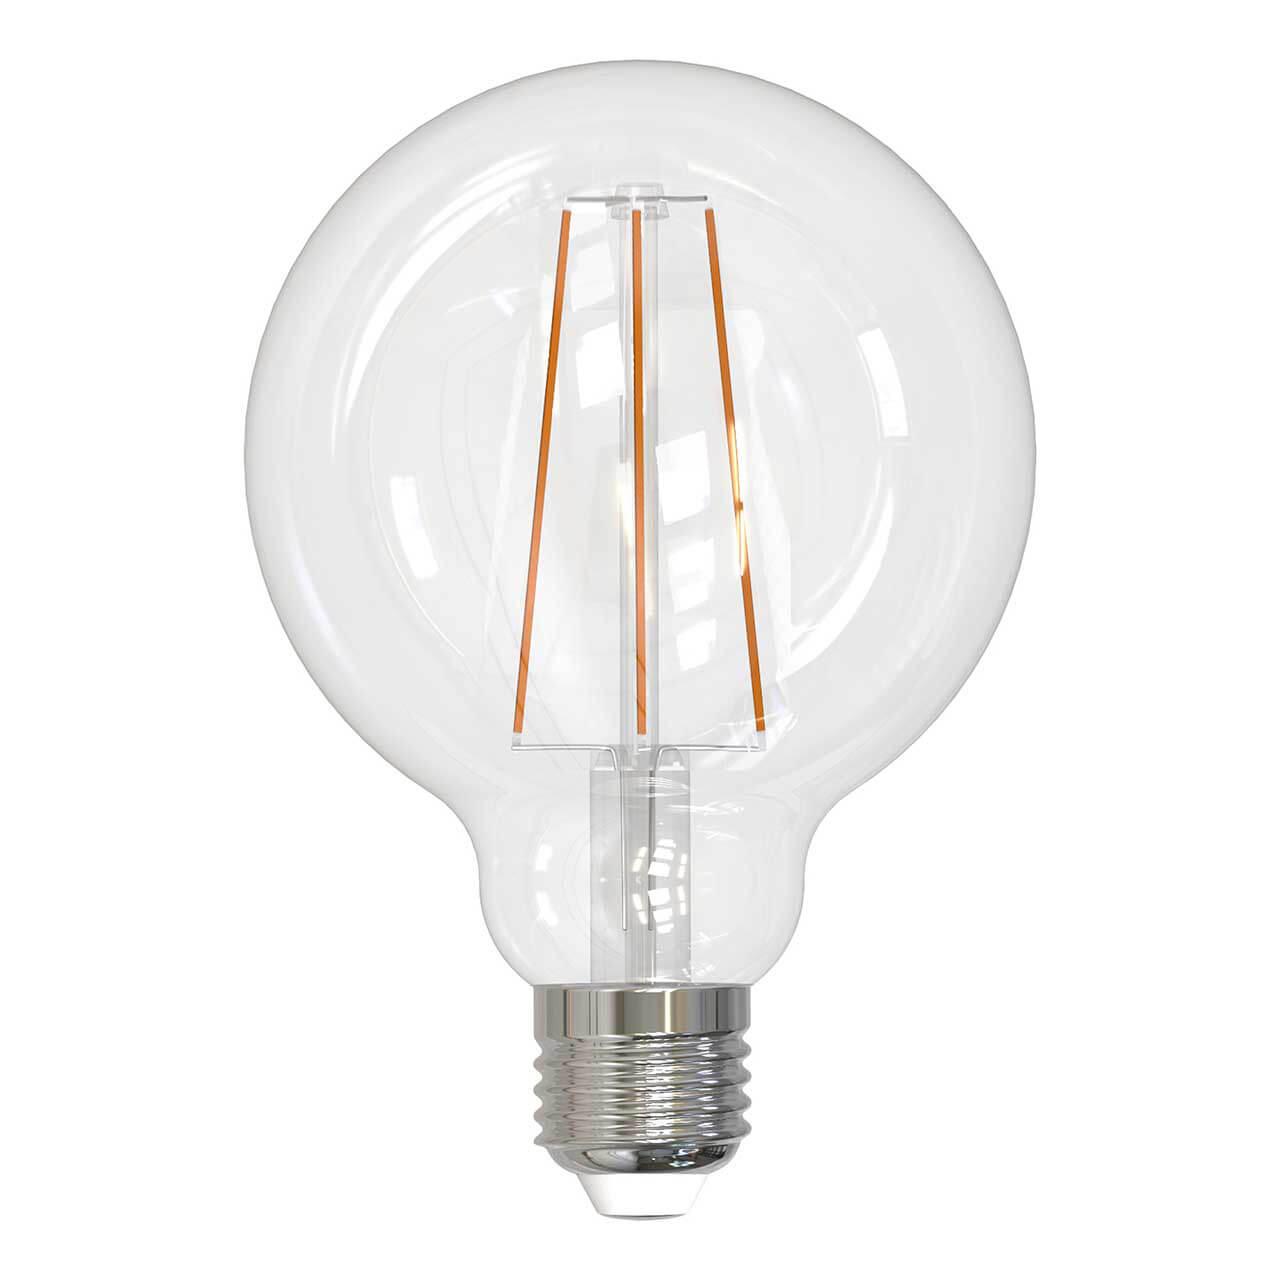 Лампочка Uniel LED-G95-15W/4000K/E27/CL PLS02WH SKY Globe лампа светодиодная филаментная ul 00001818 uniel e27 4w 2250k прозрачная led g95 4w golden e27 cw glv21go